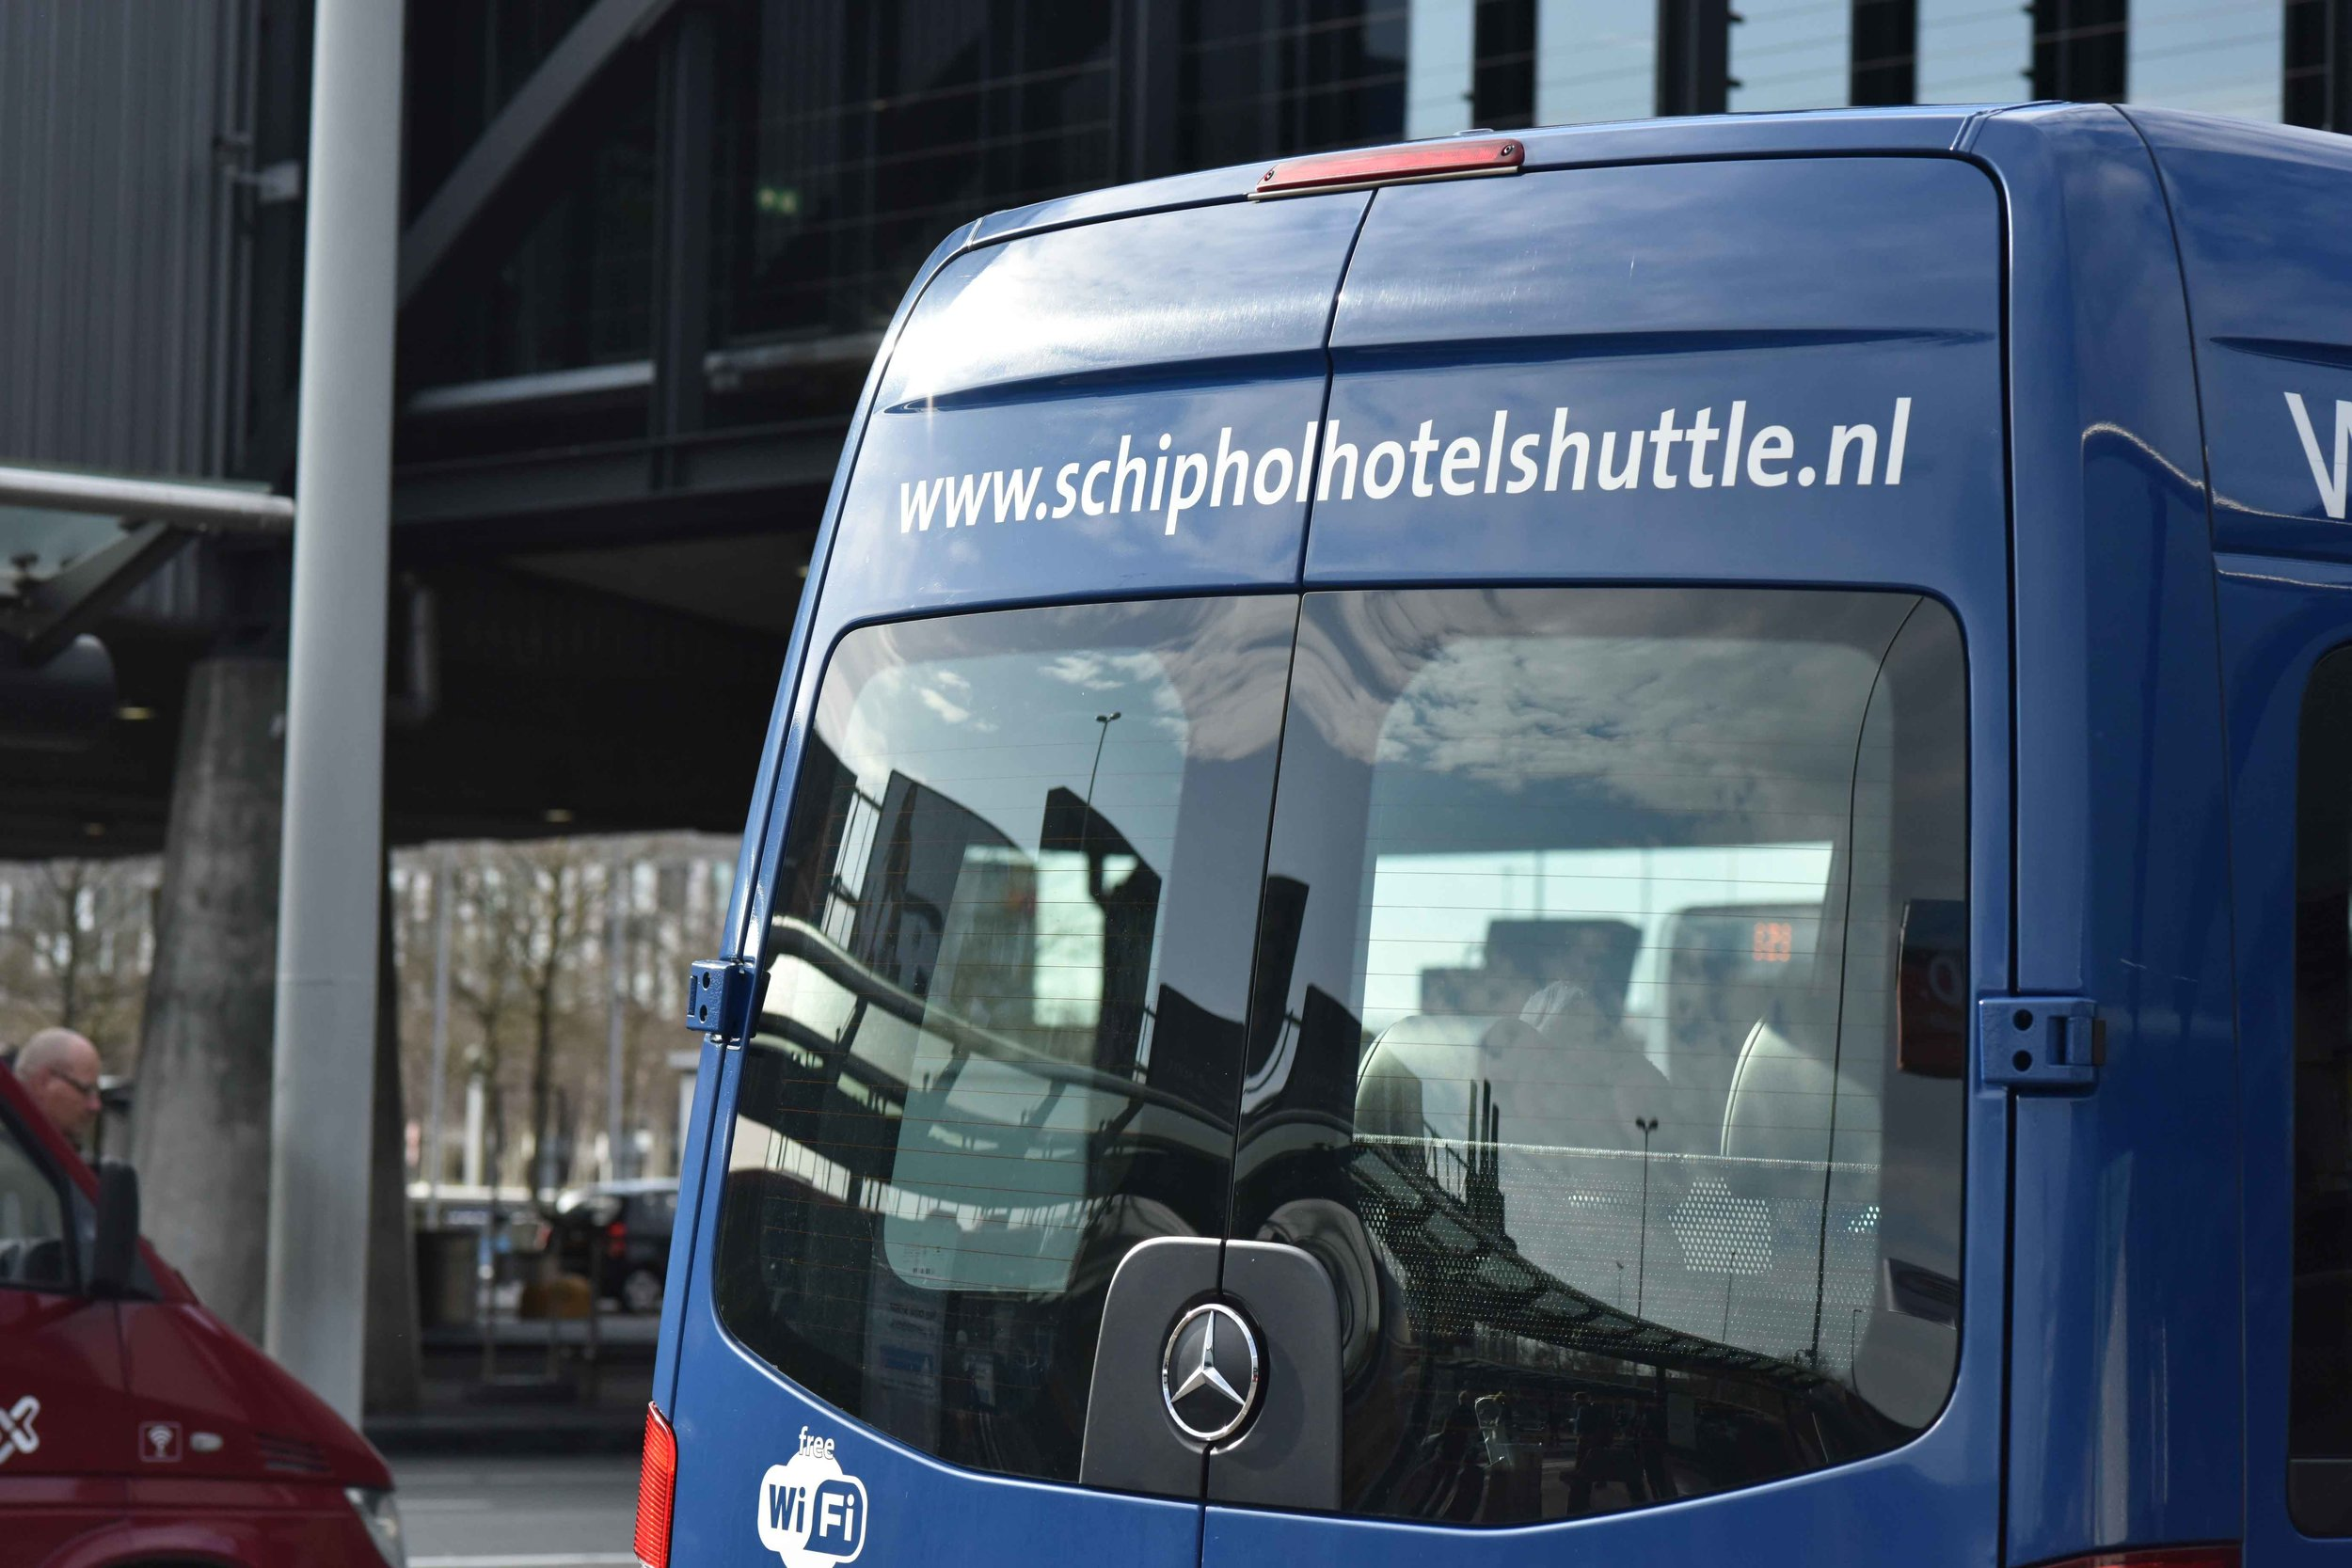 Shuttle service,Schiphol airport, Amsterdam. Photo: Gunjan Virk. Image©thingstodot.com